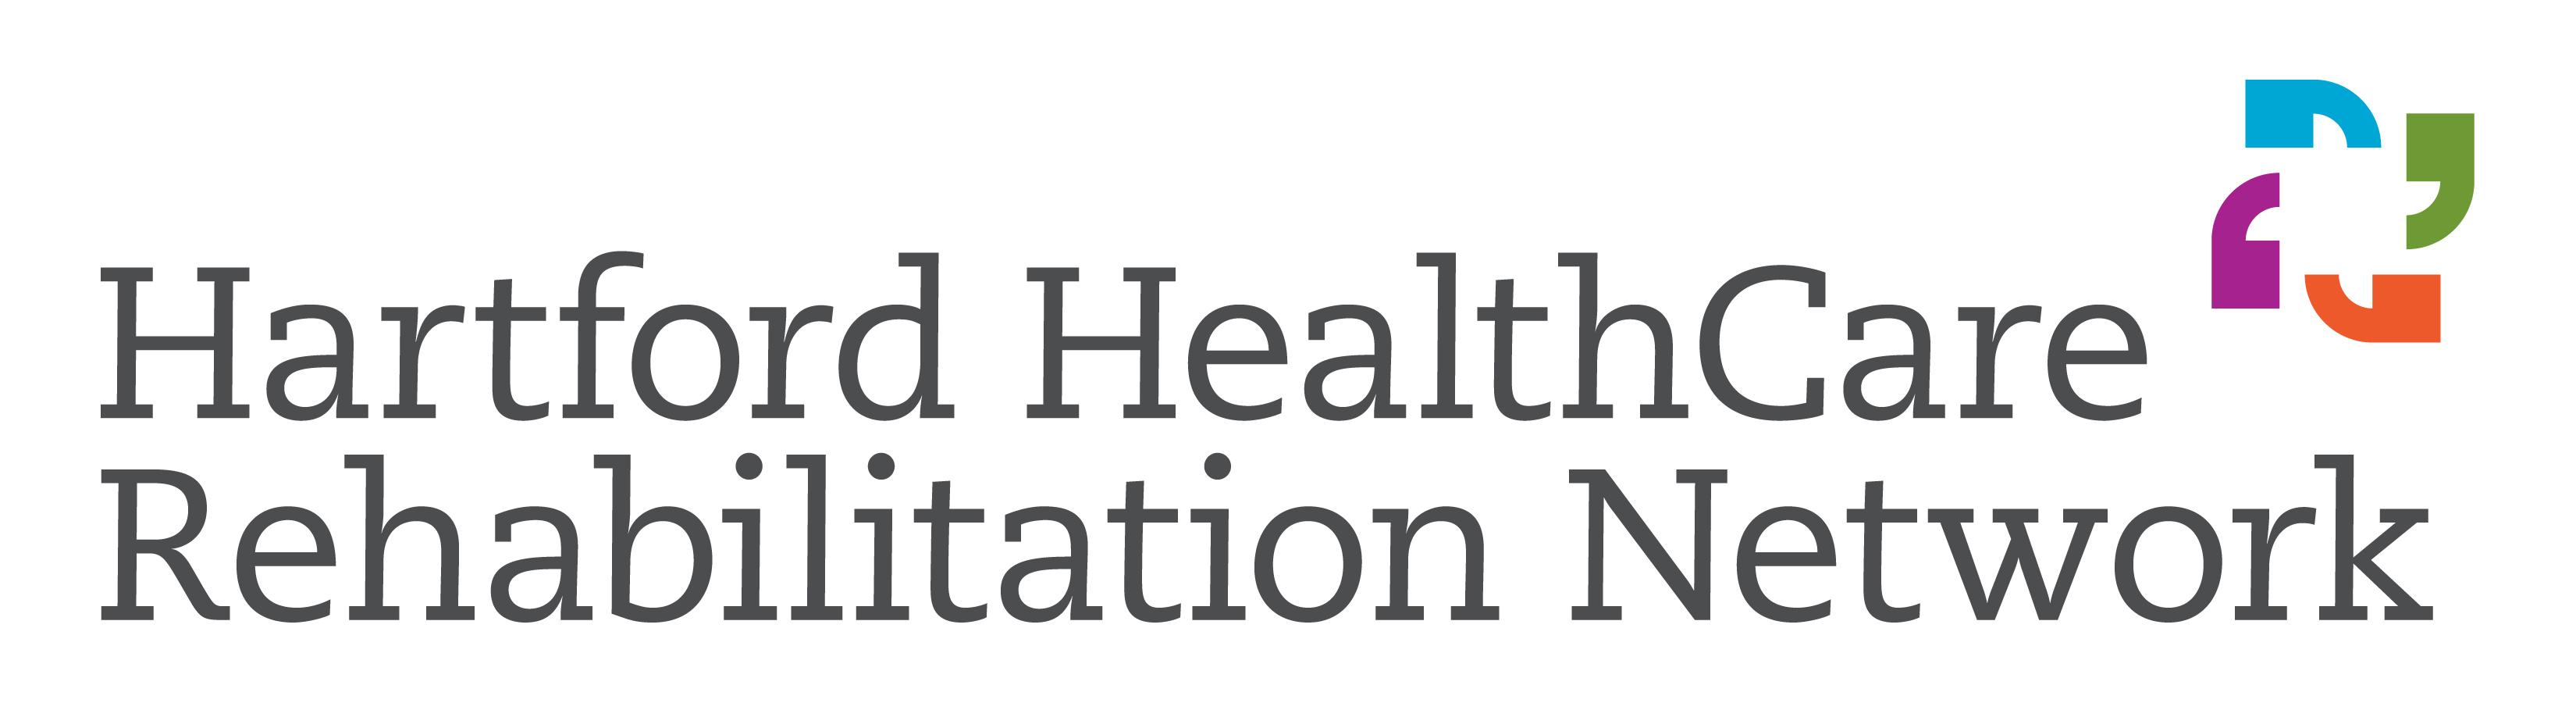 Hartford HealthCare Rehabilitation Network Logo